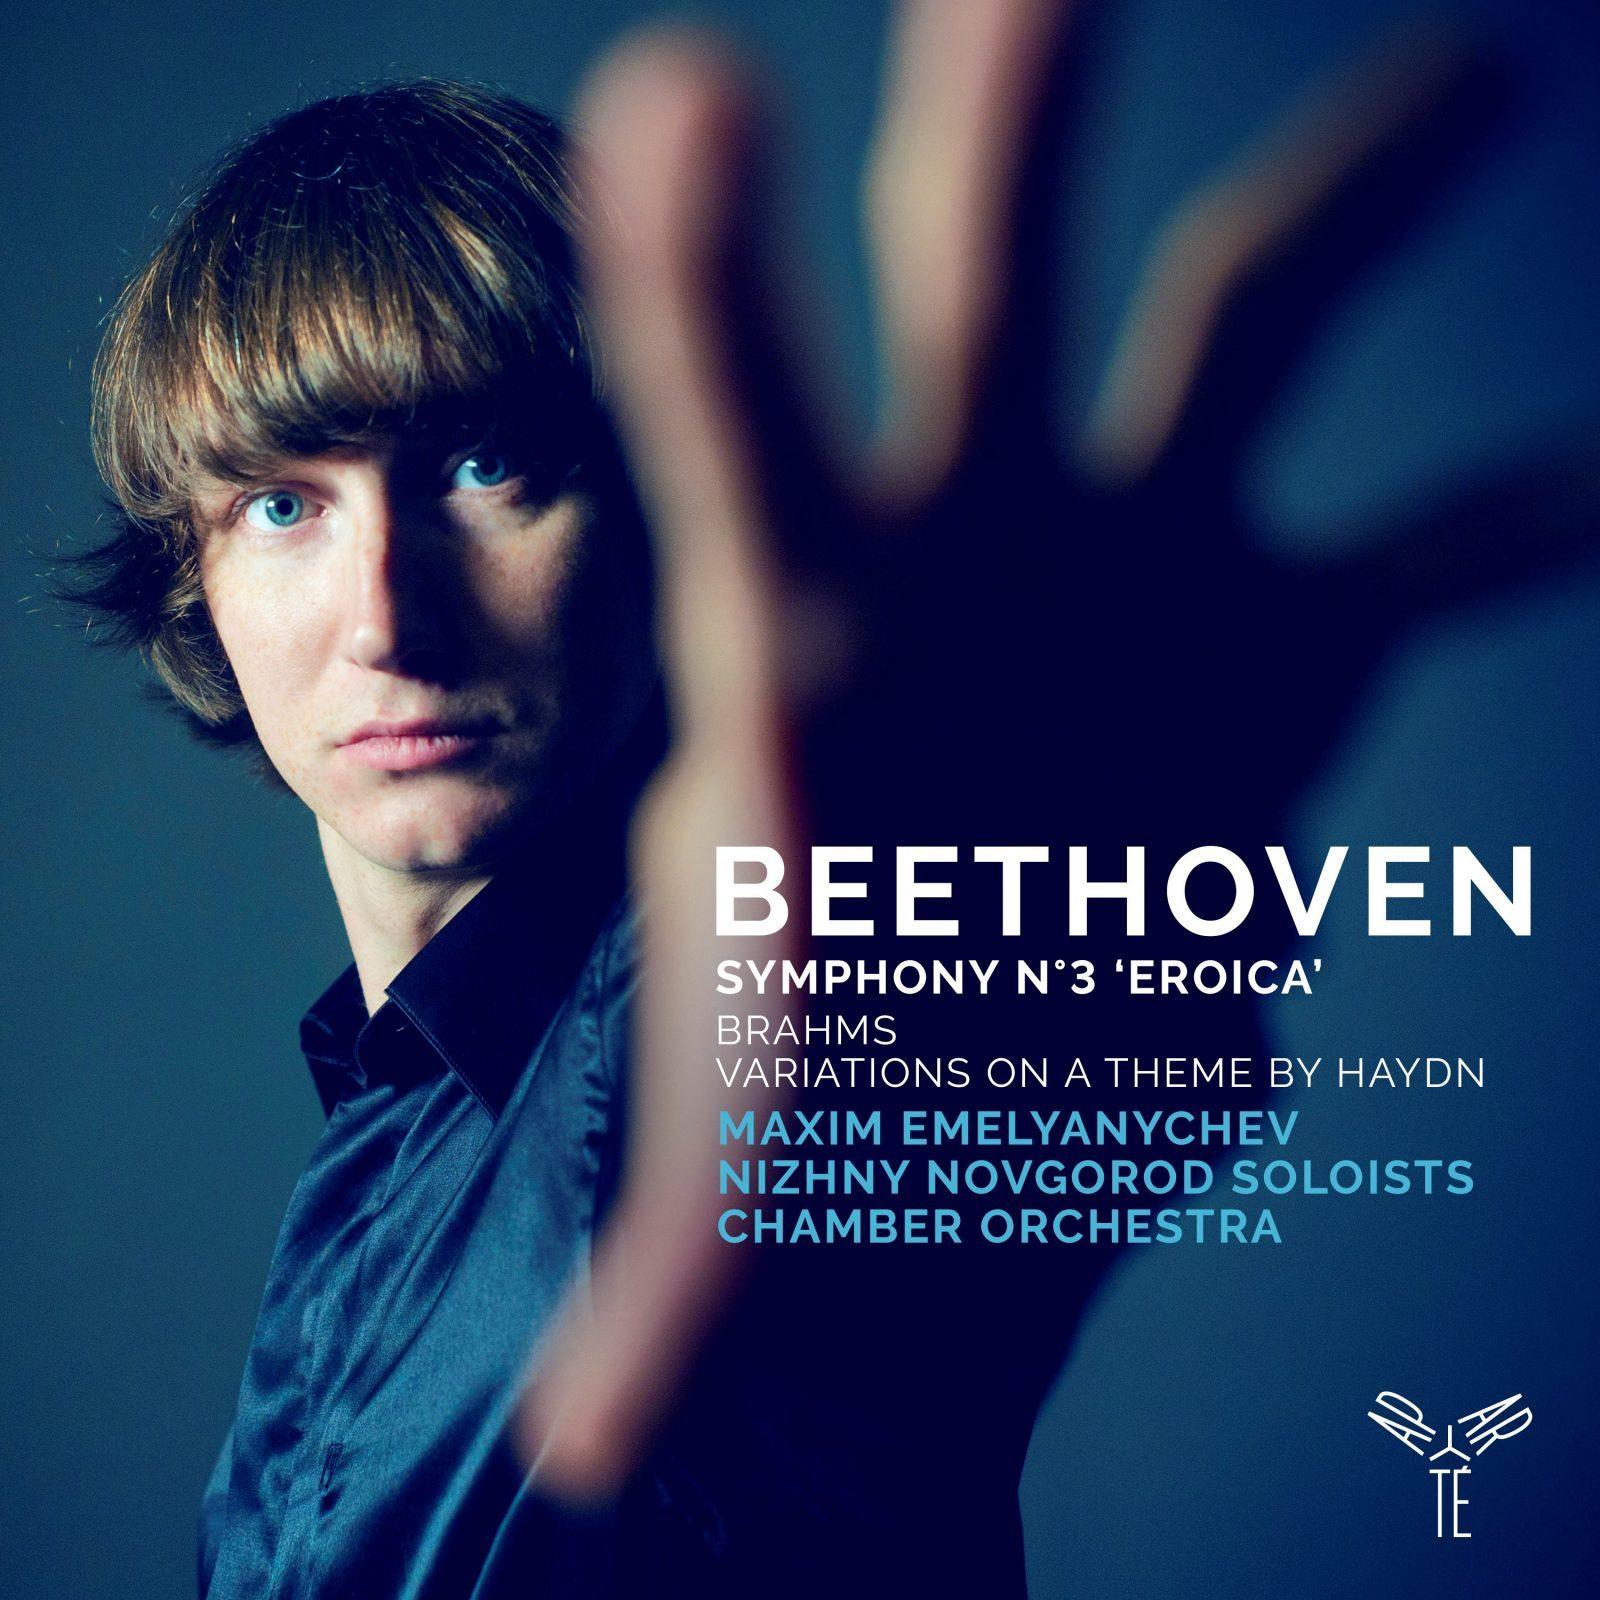 Beethoven: Symphony No.3 'Eroica'